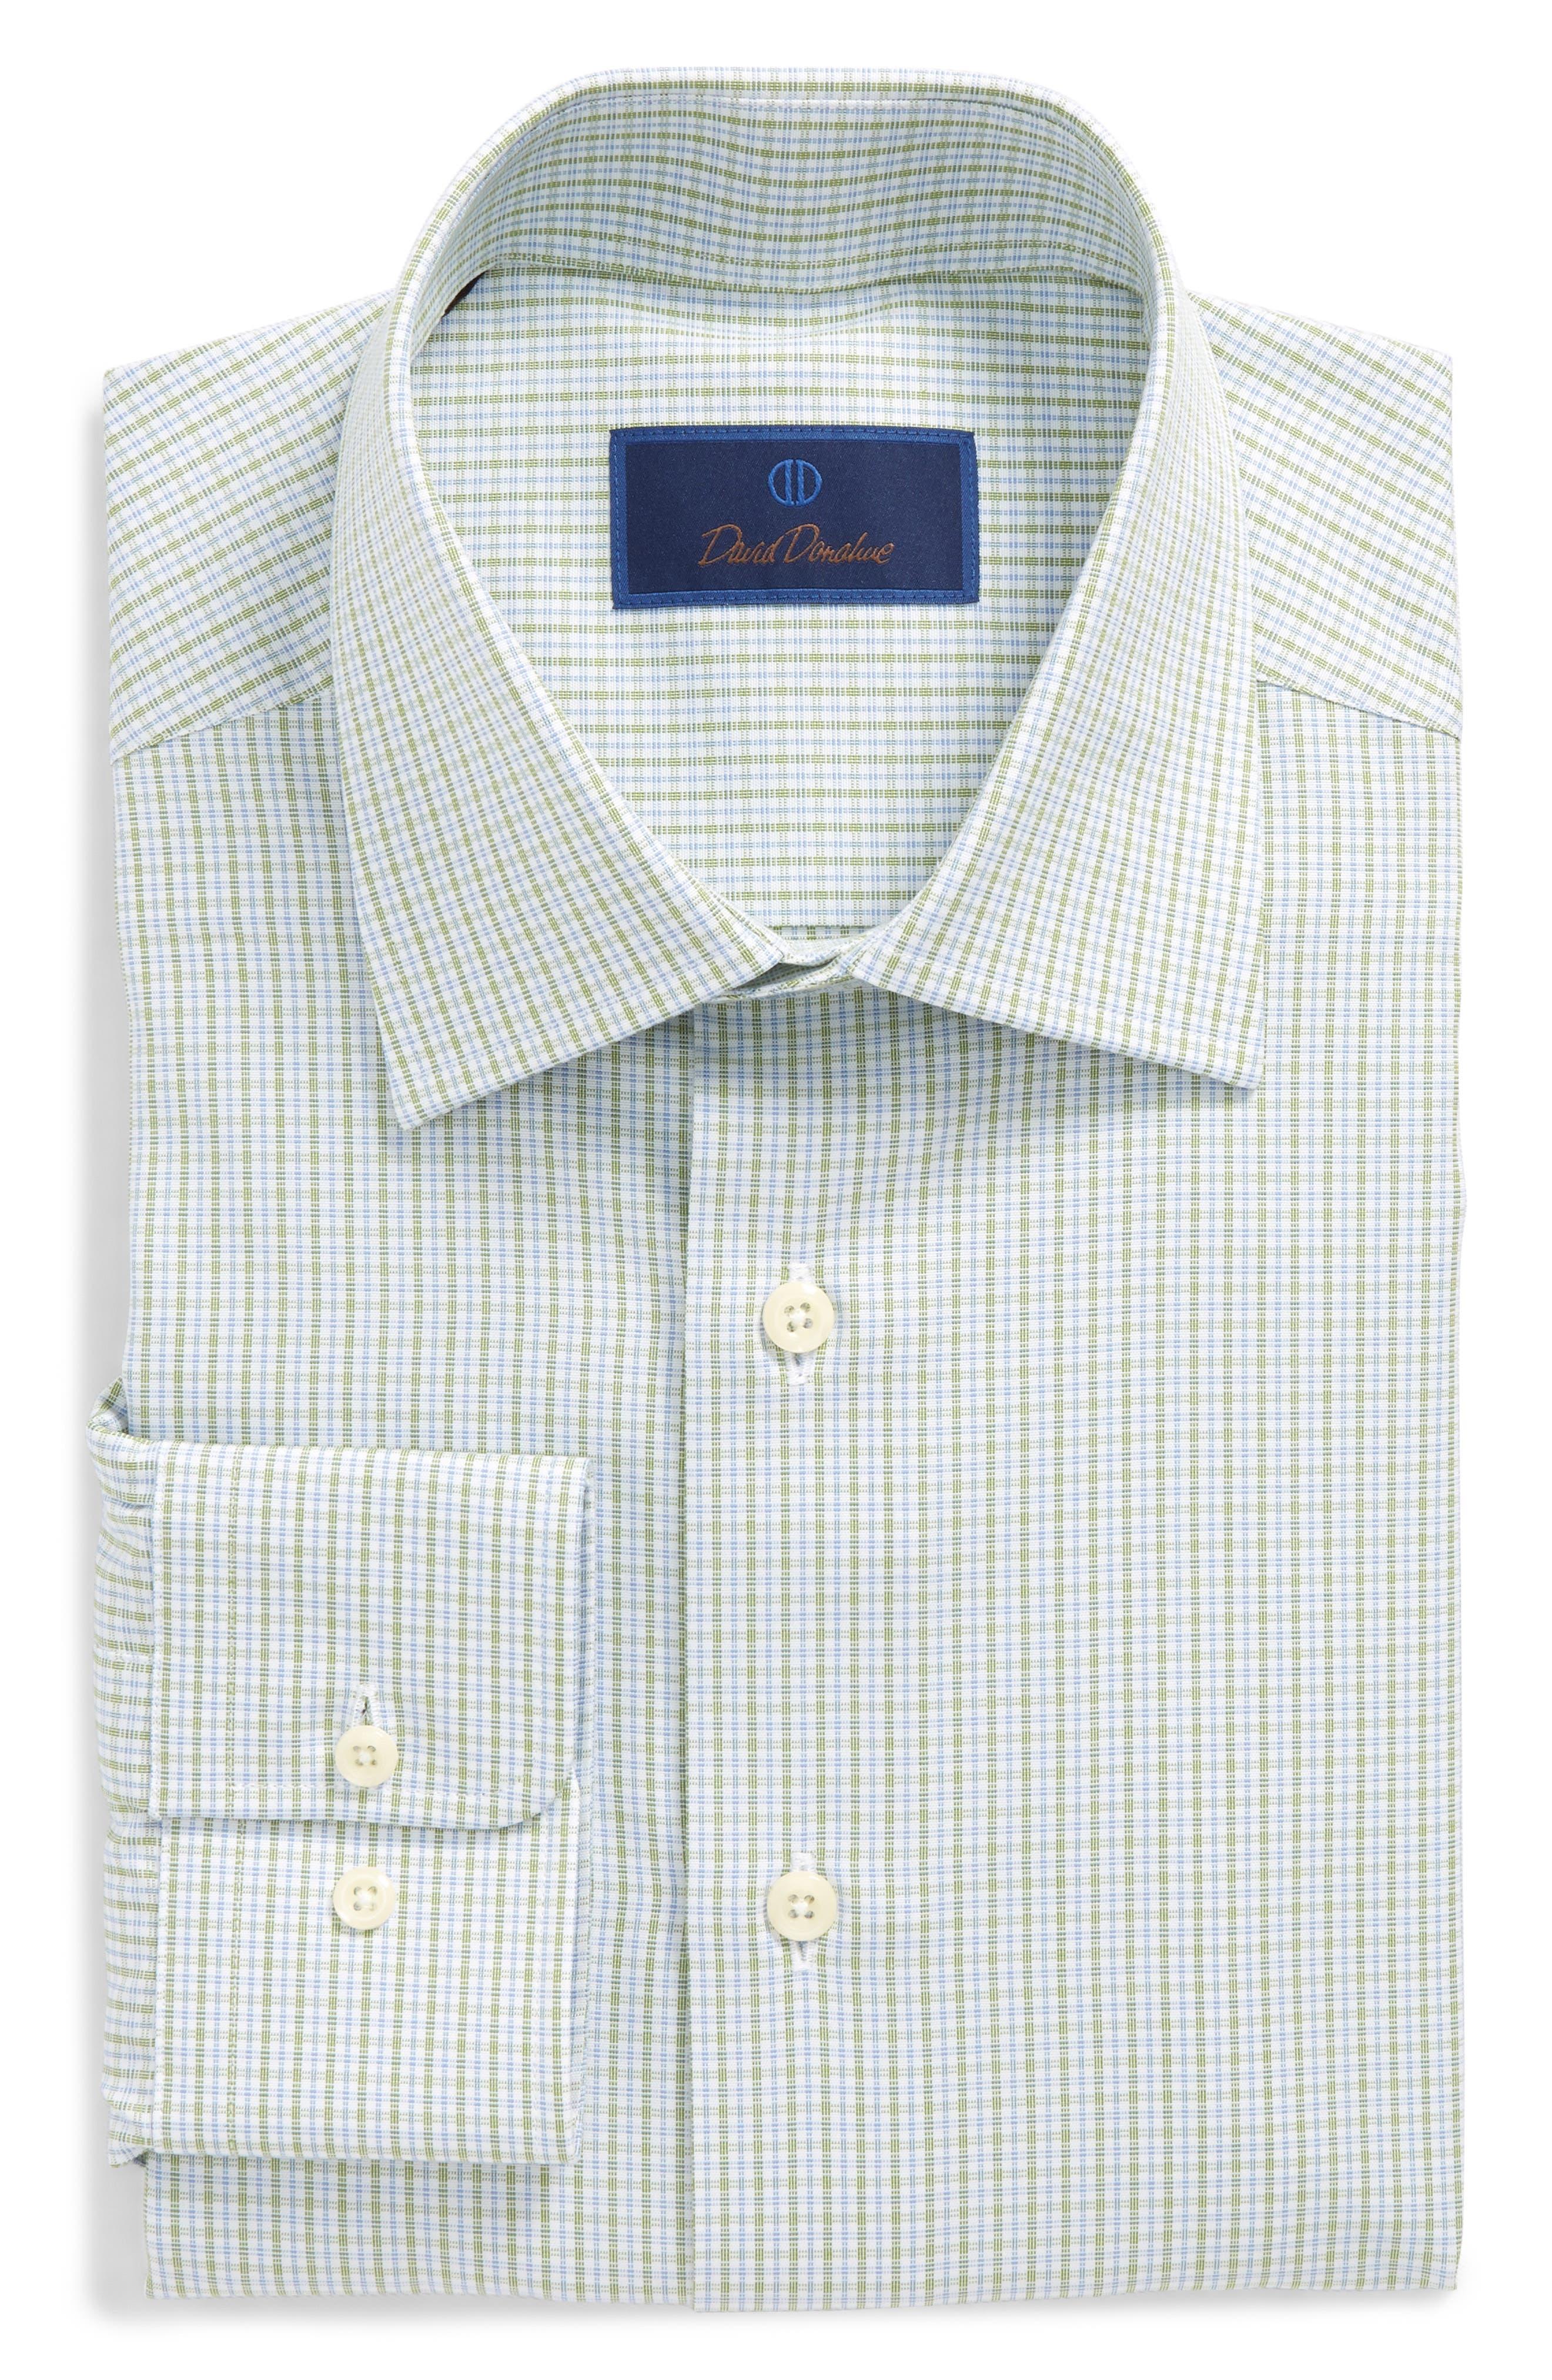 Regular Fit Check Dress Shirt,                             Main thumbnail 1, color,                             Grass